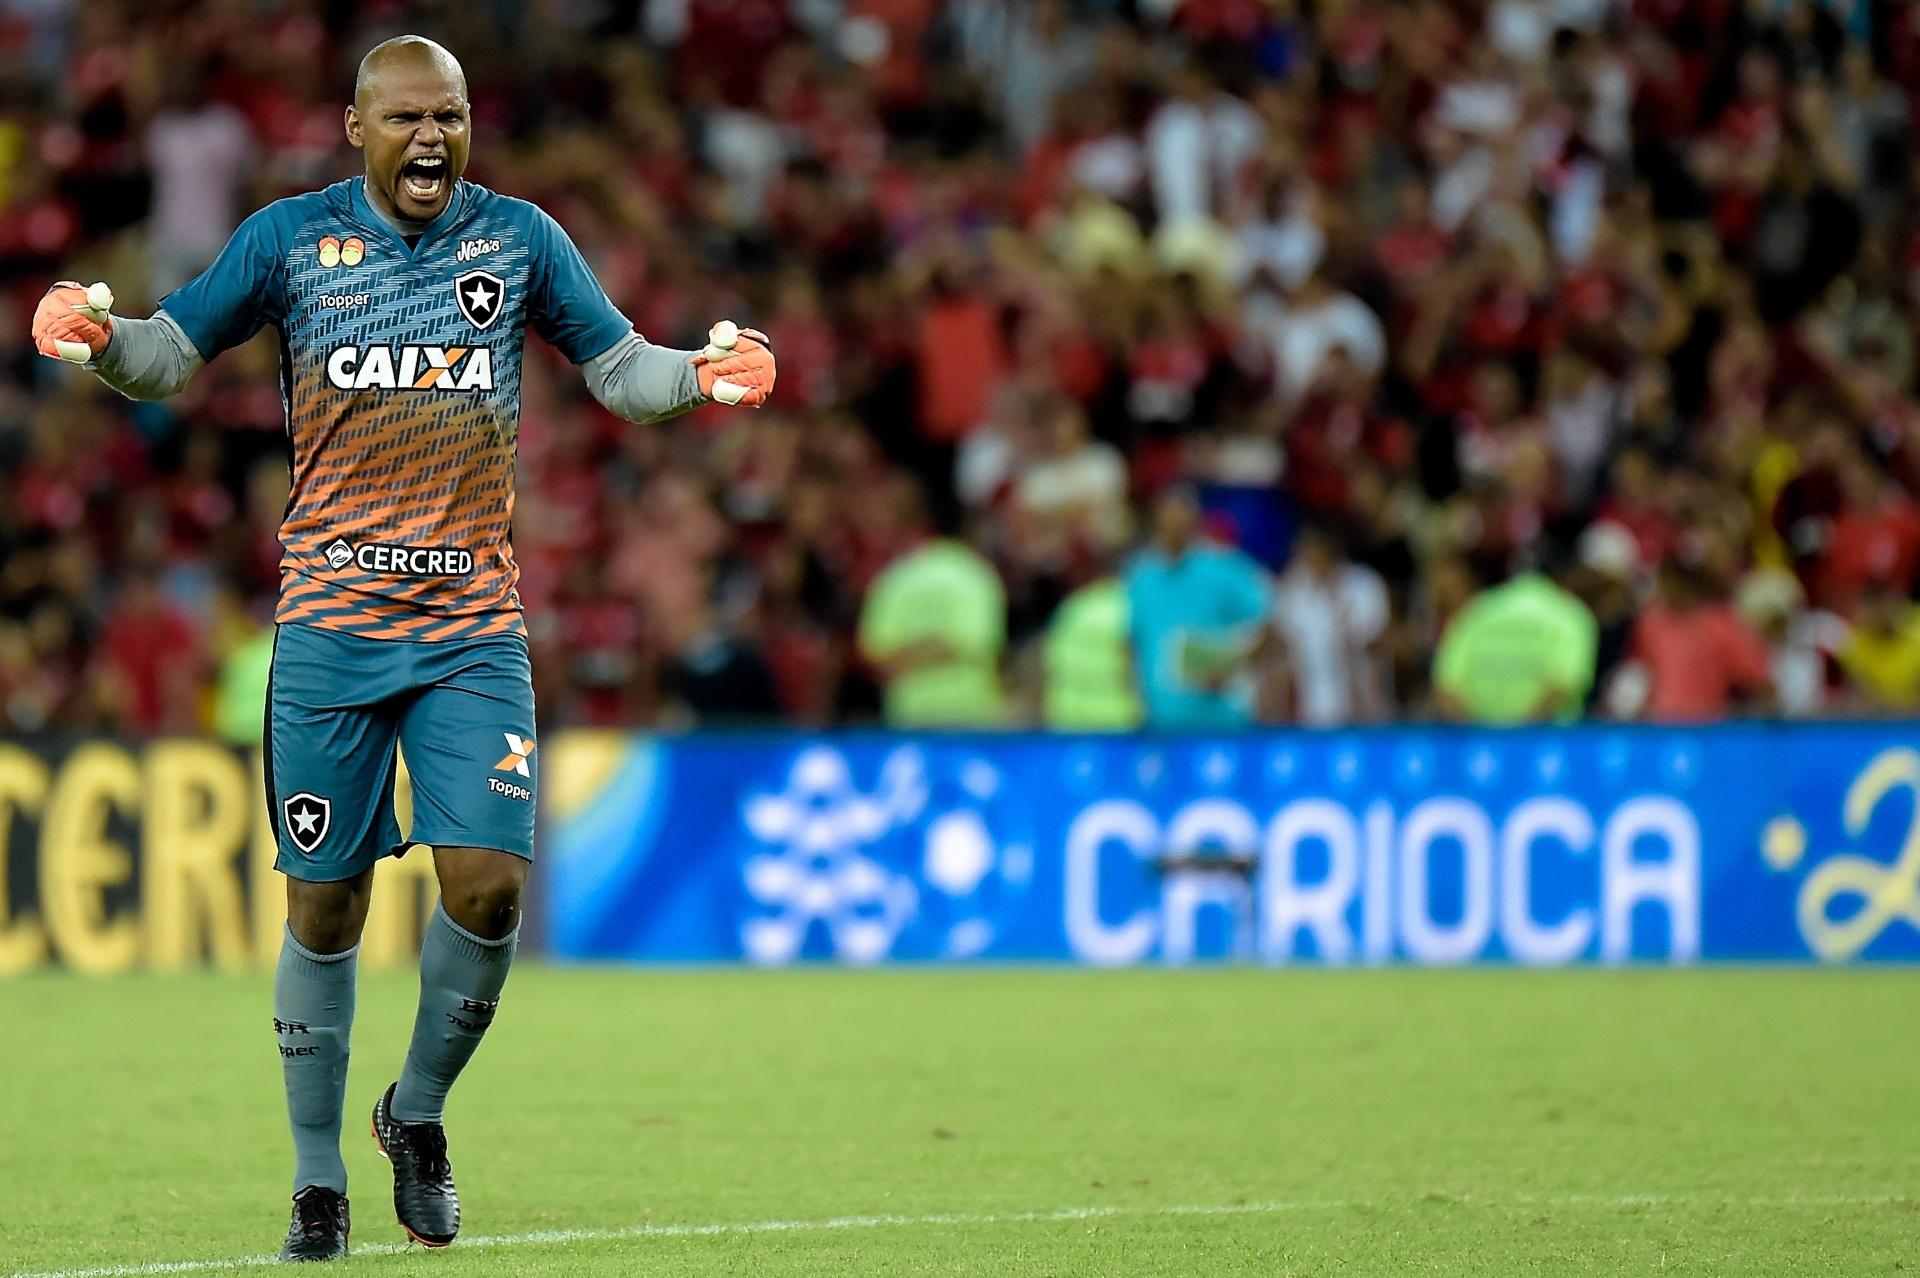 Após título do Botafogo fcf71065e703d